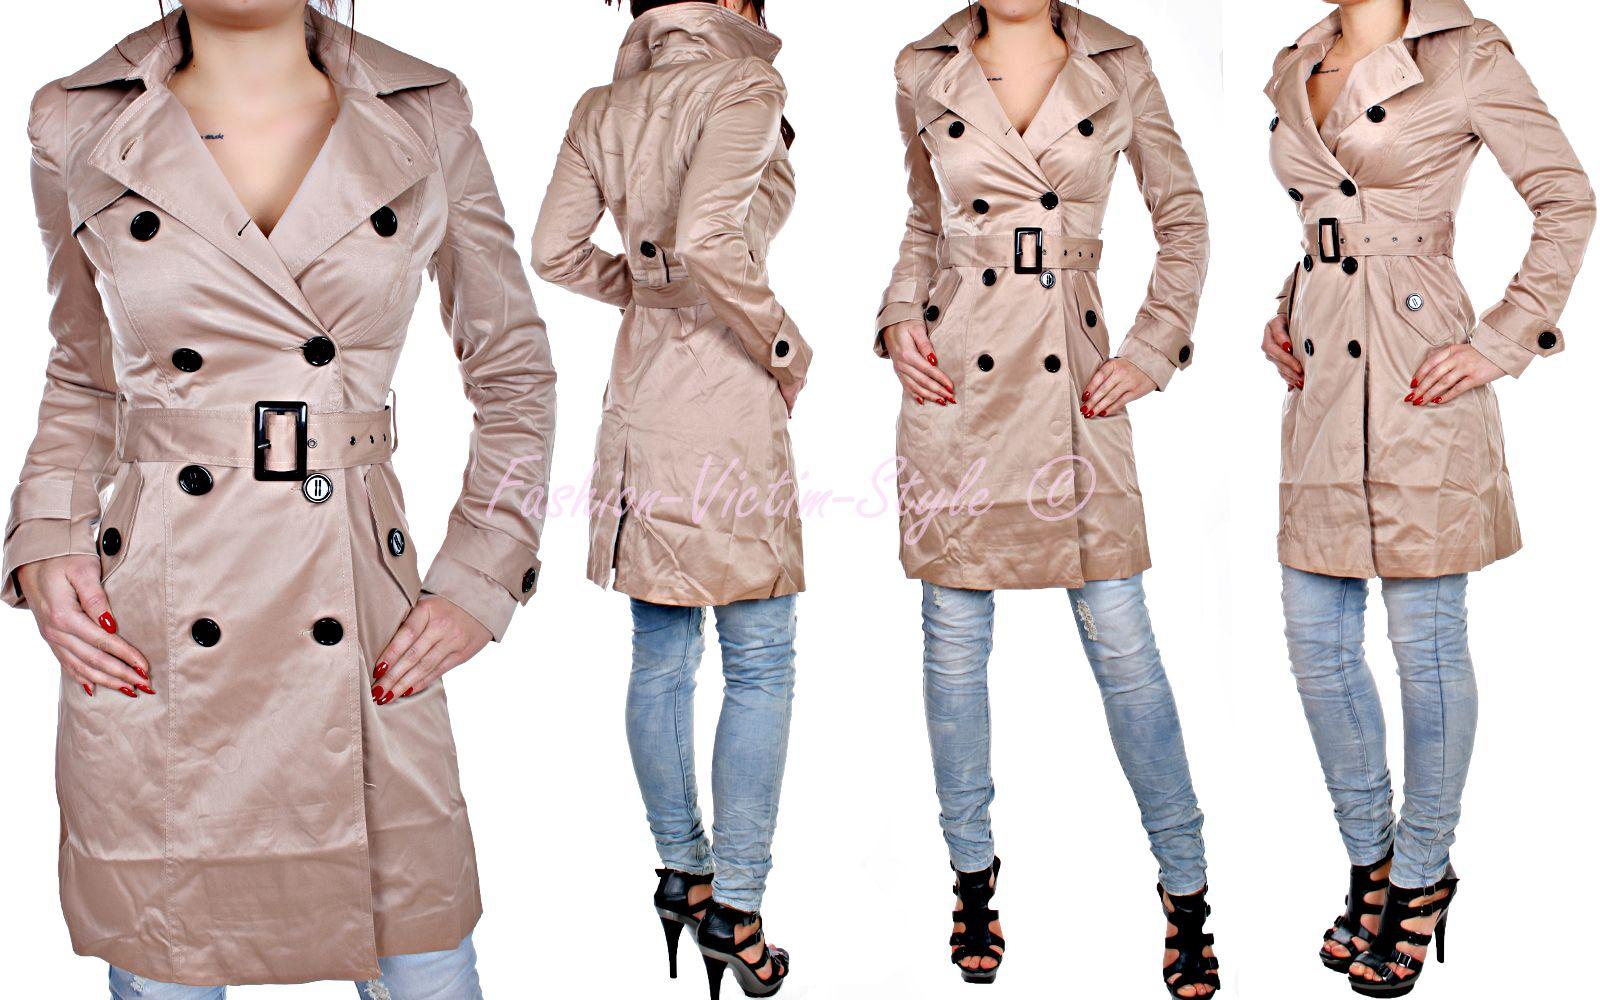 damen jacke trenchcoat mantel pea coat bergangs jacke schwarz beige ebay. Black Bedroom Furniture Sets. Home Design Ideas